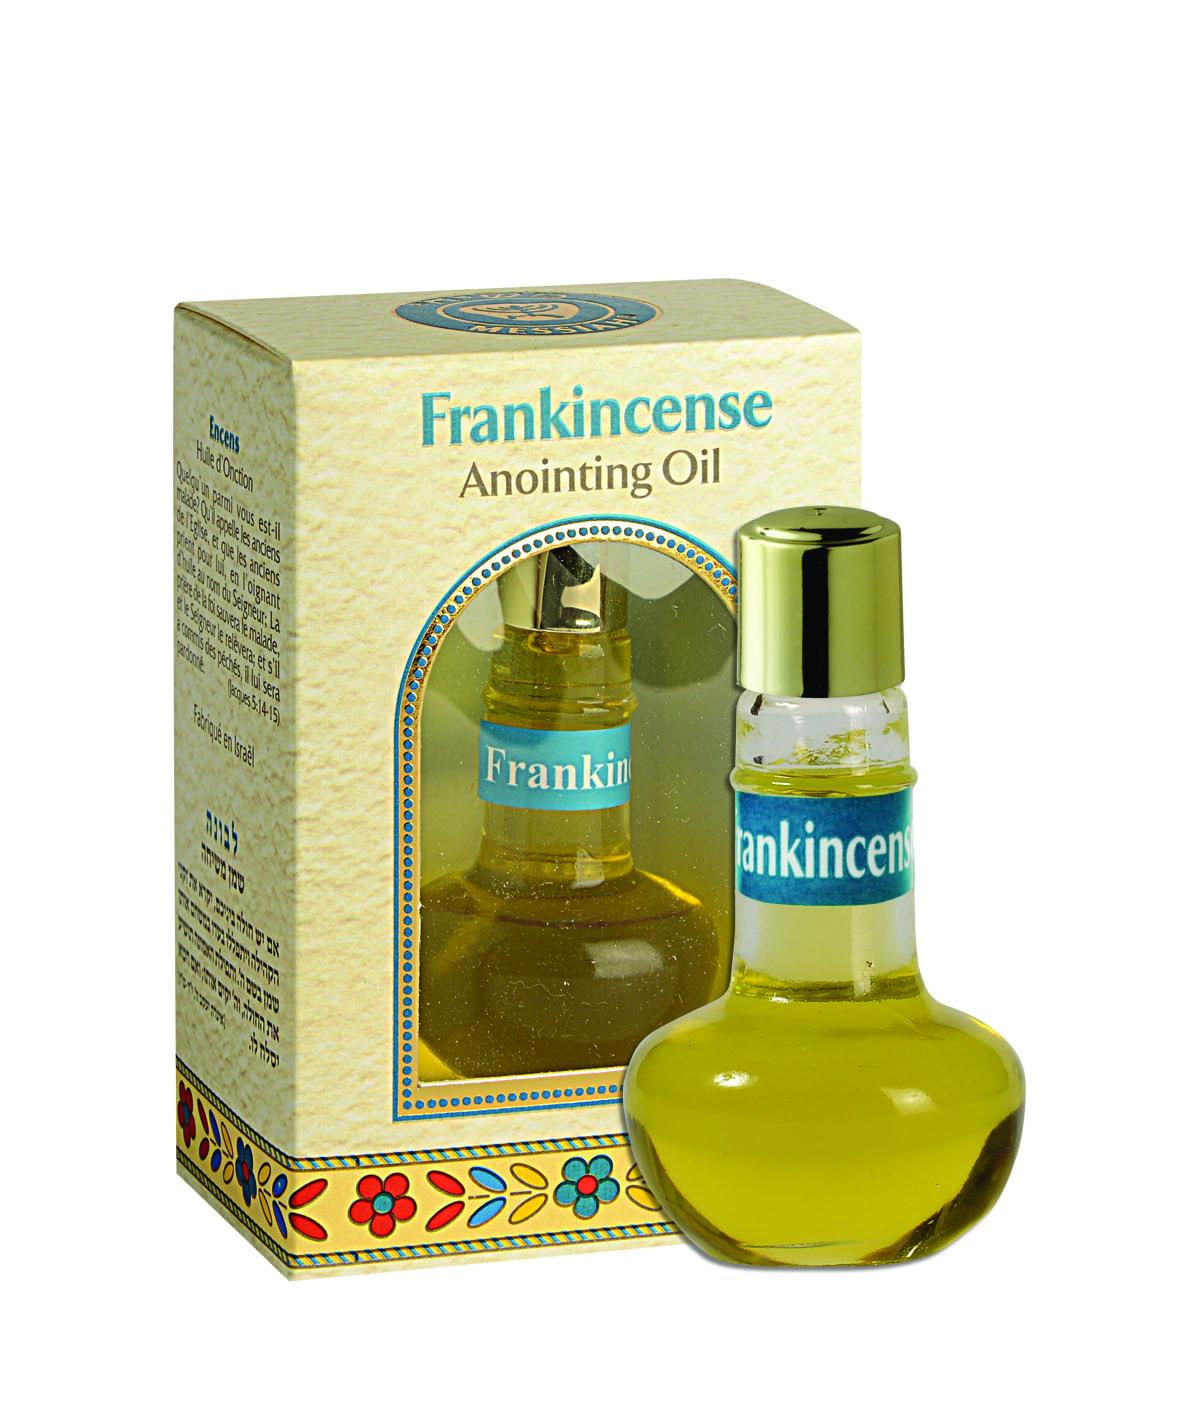 Anointing Oil Frankincense Myrrh and Spikenard Fragrance